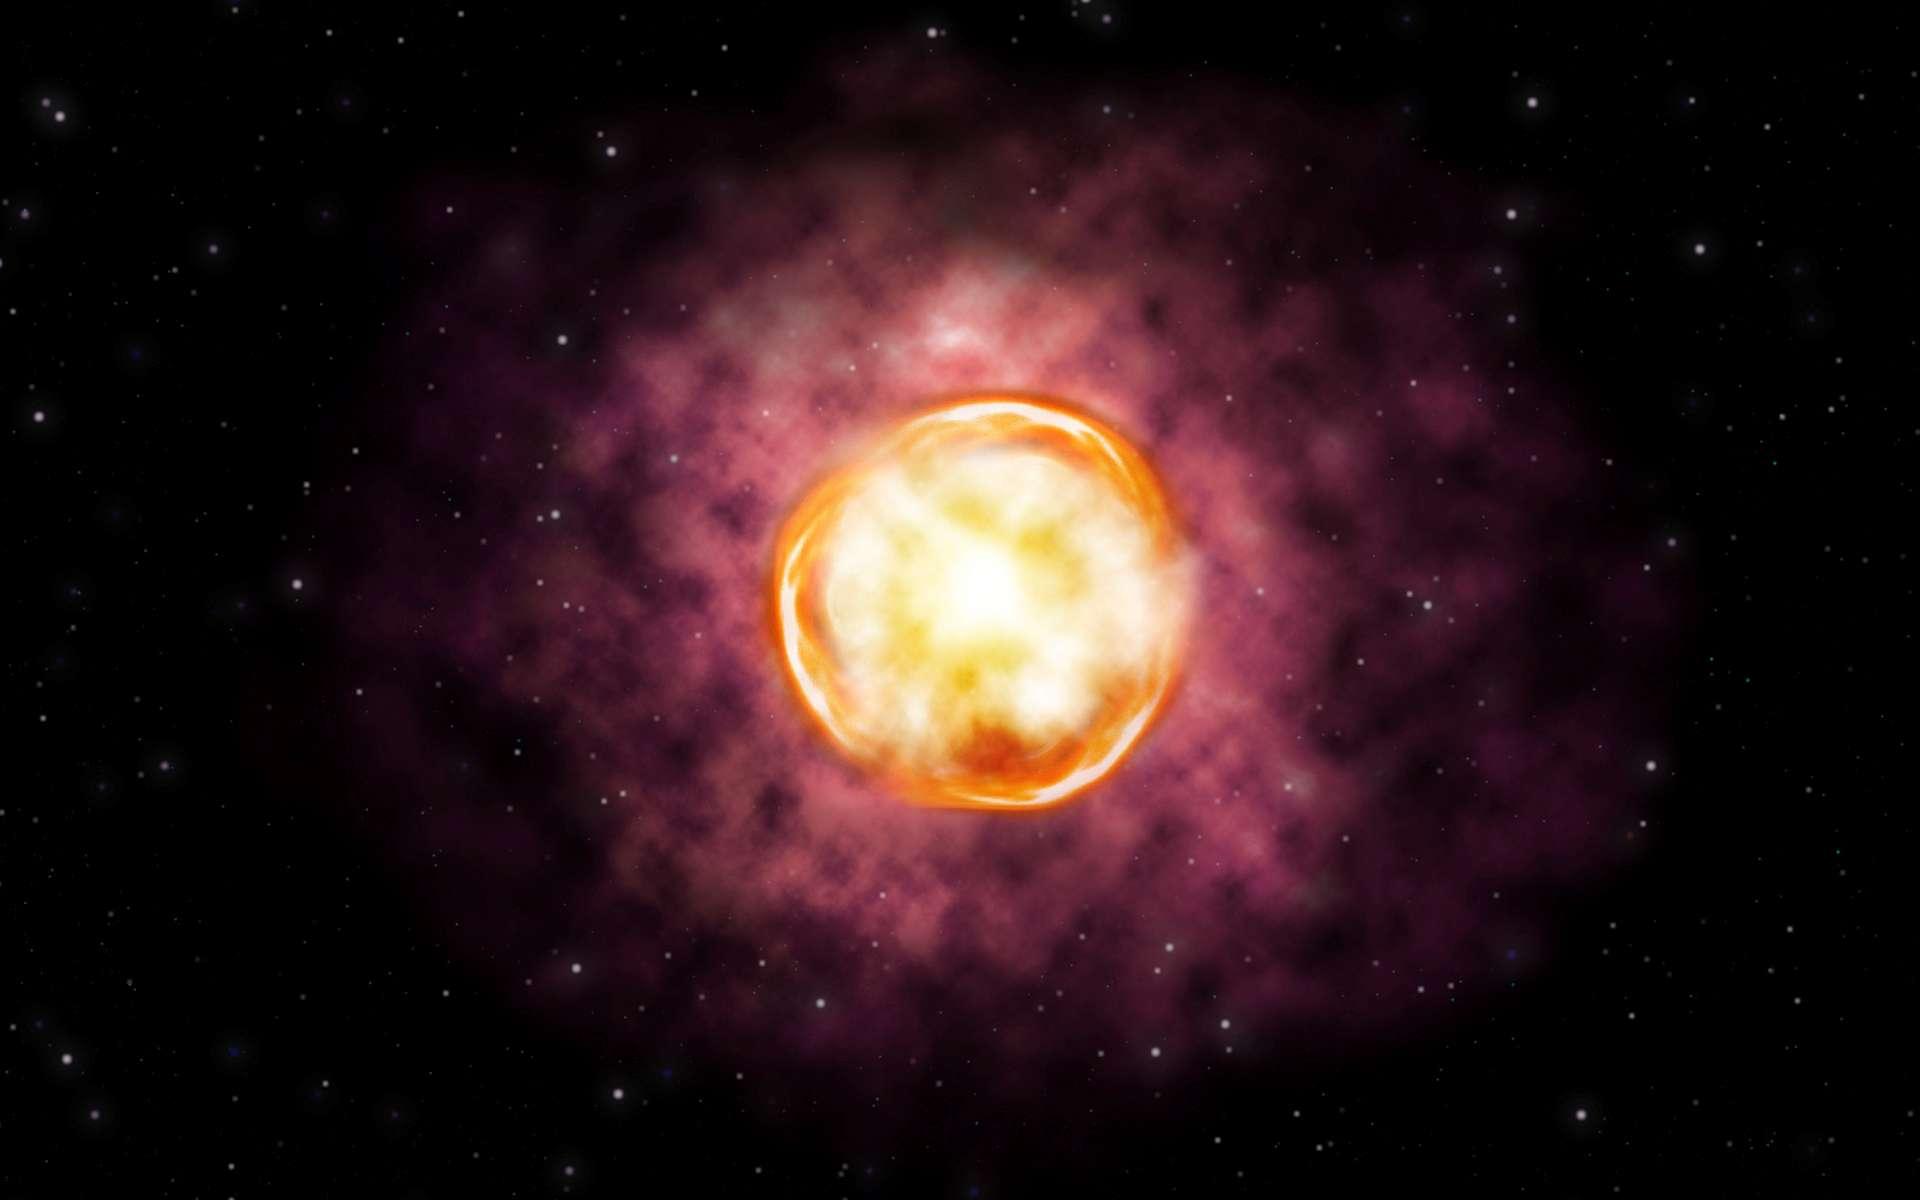 Vue d'artiste de la supernova instabilité de paire SN 2016iet. © Gemini Observatory/NSF/AURA/Joy Pollard